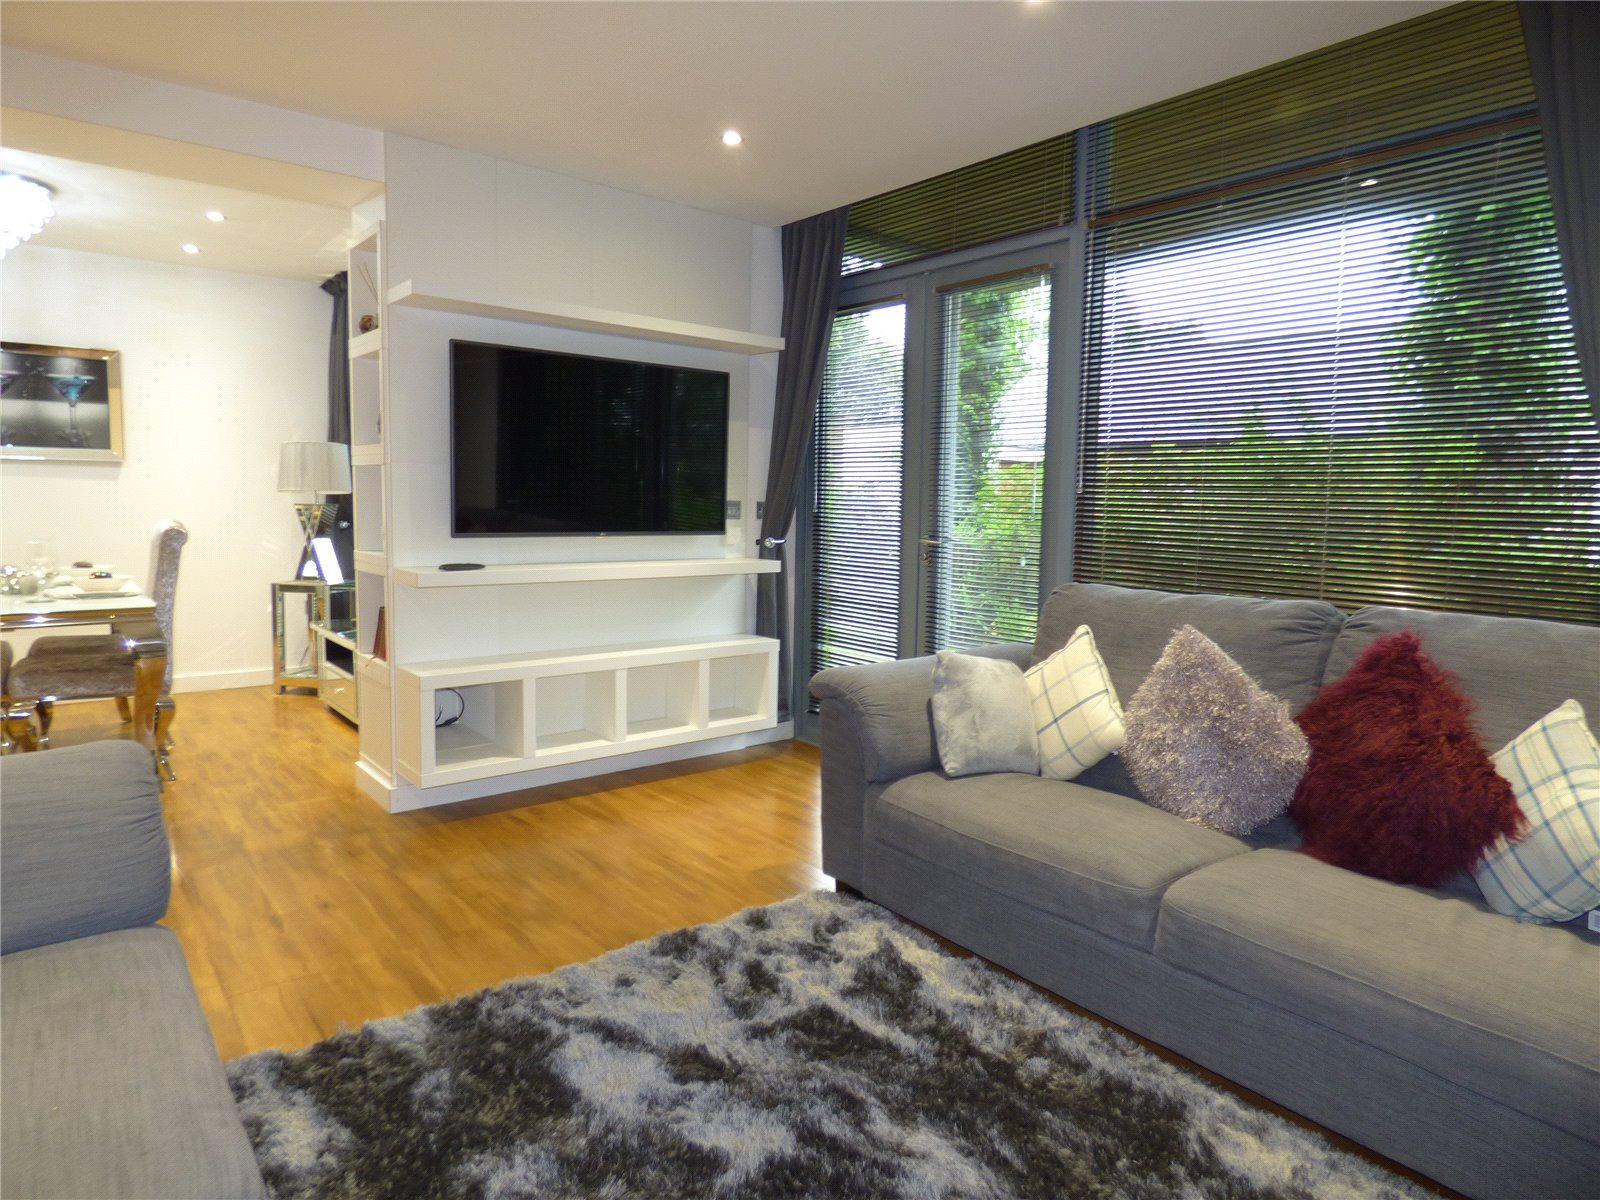 Property Details 2 Bedroomflat Fernhill Grasscroft